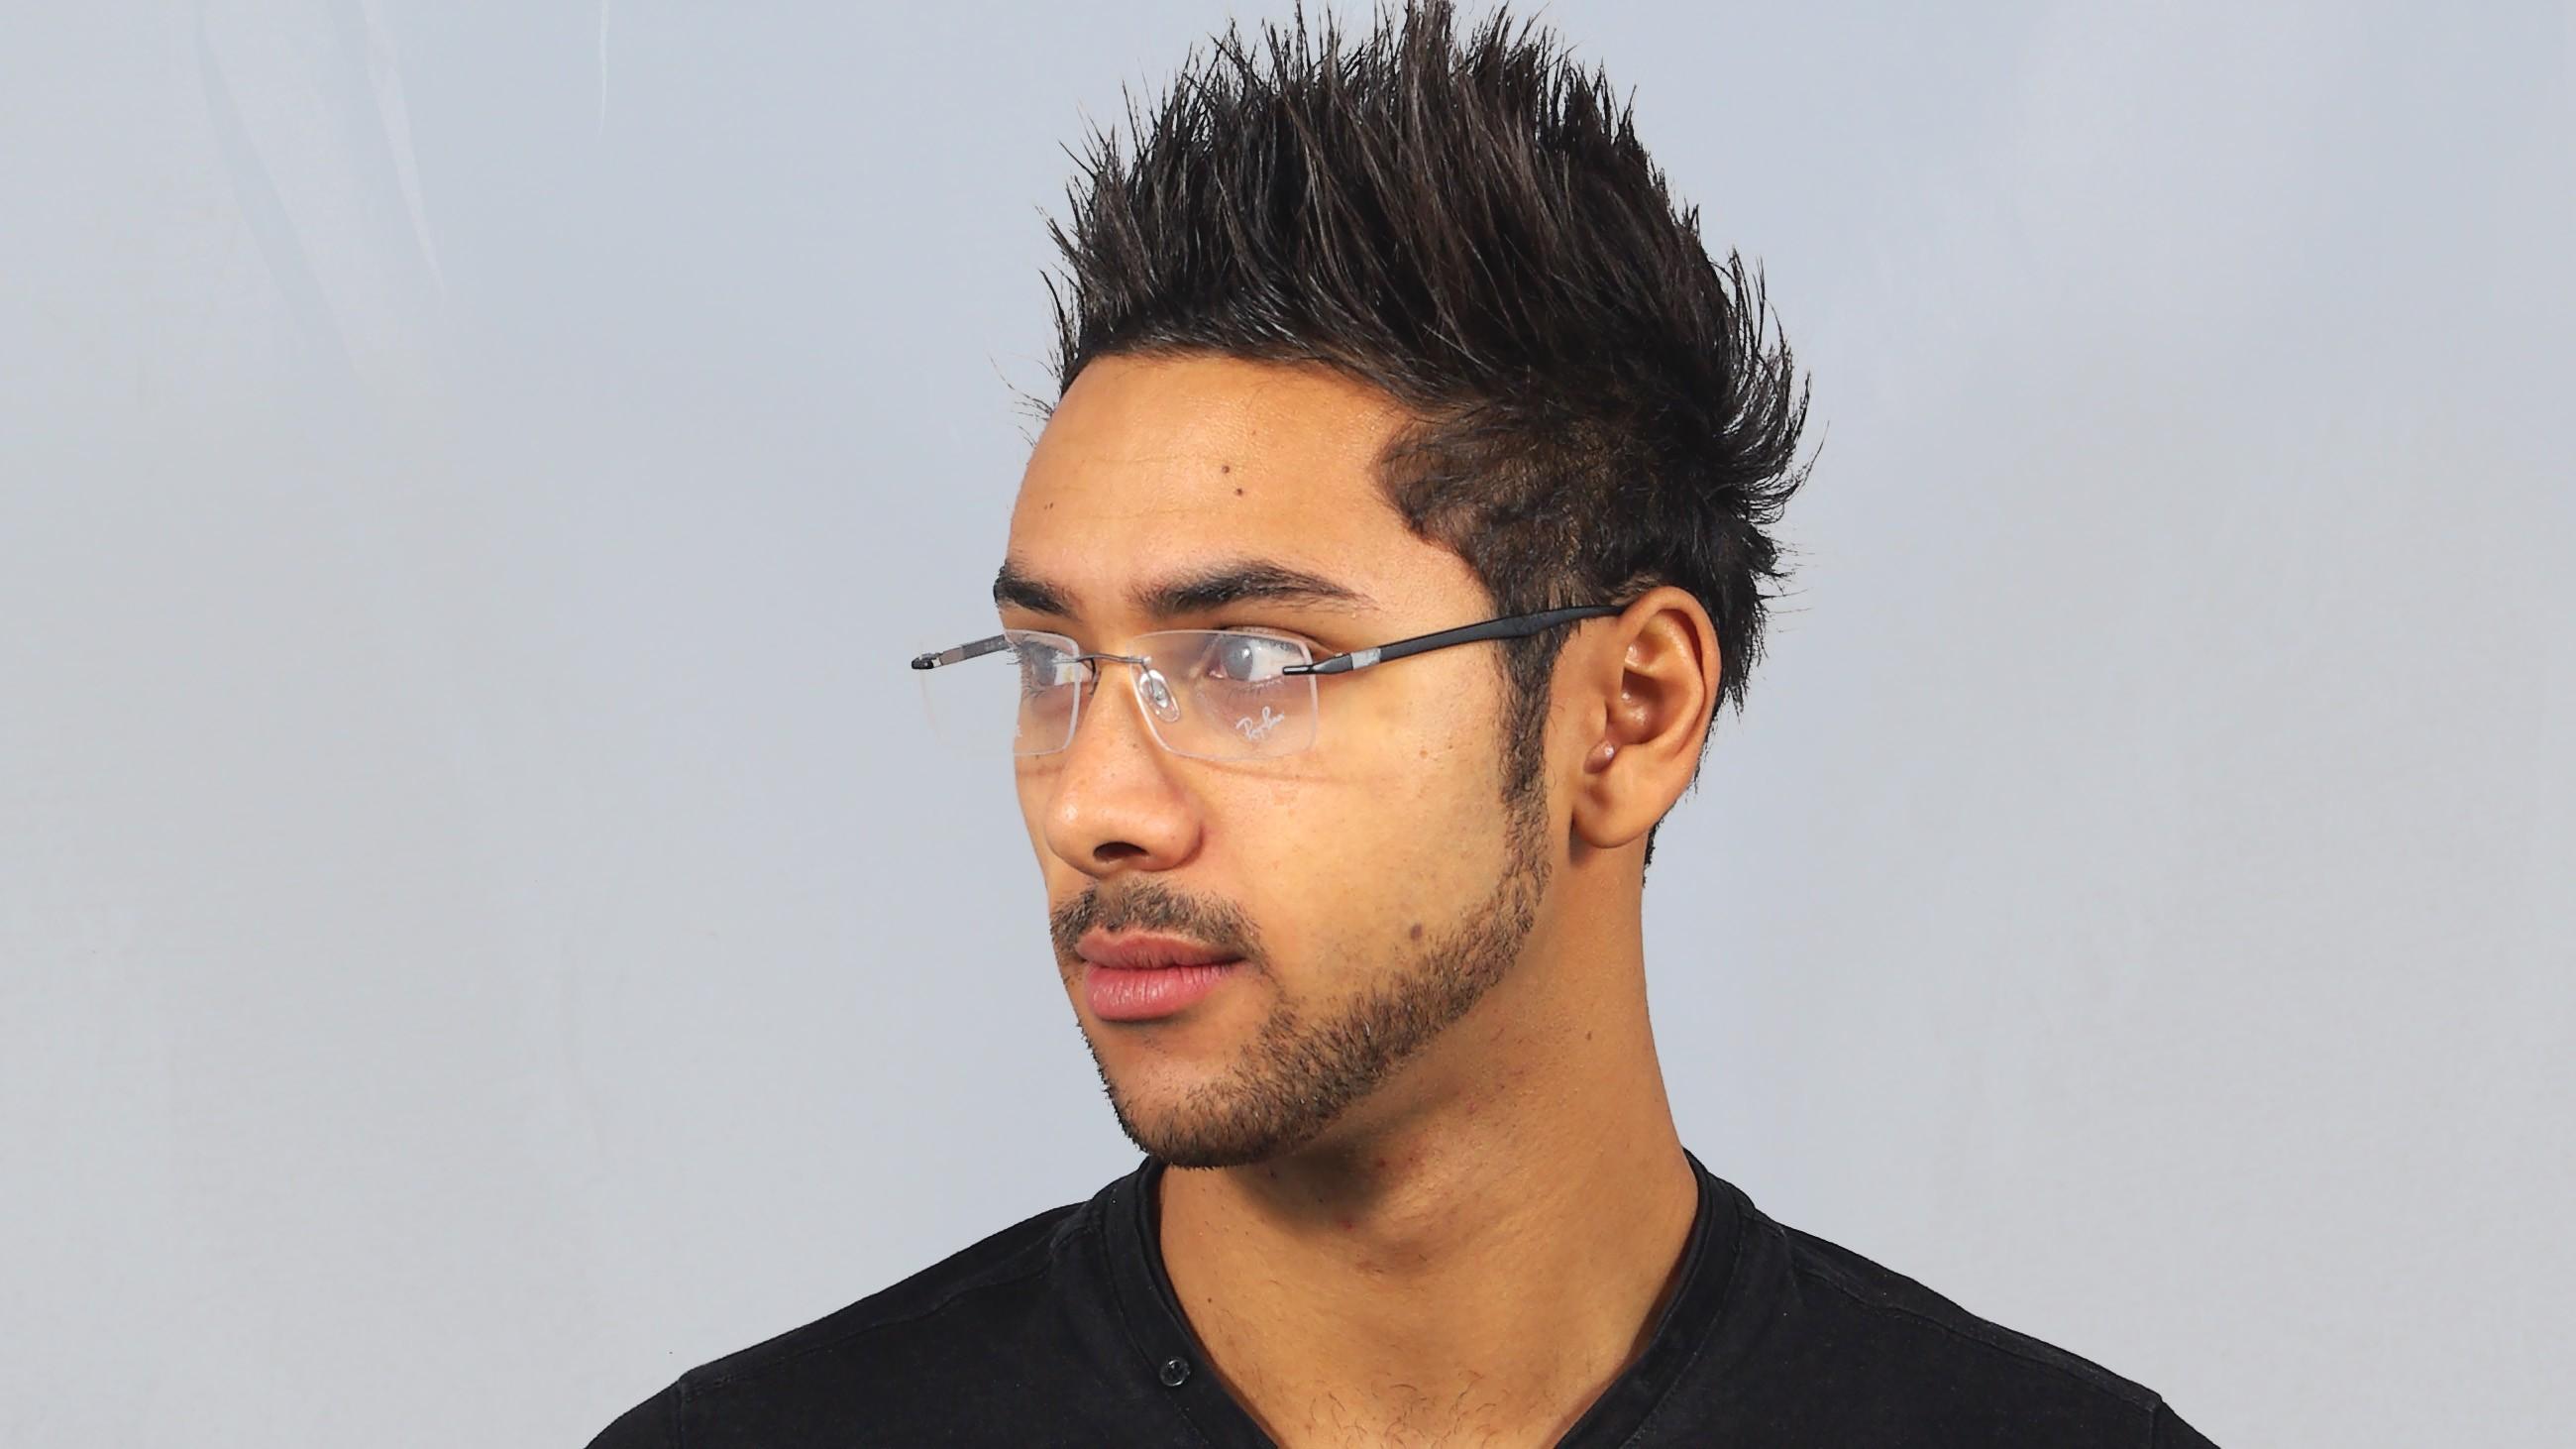 485584b09b Ray-ban Liteforce Eyeglasses Rb 8724 1128 - Bitterroot Public Library